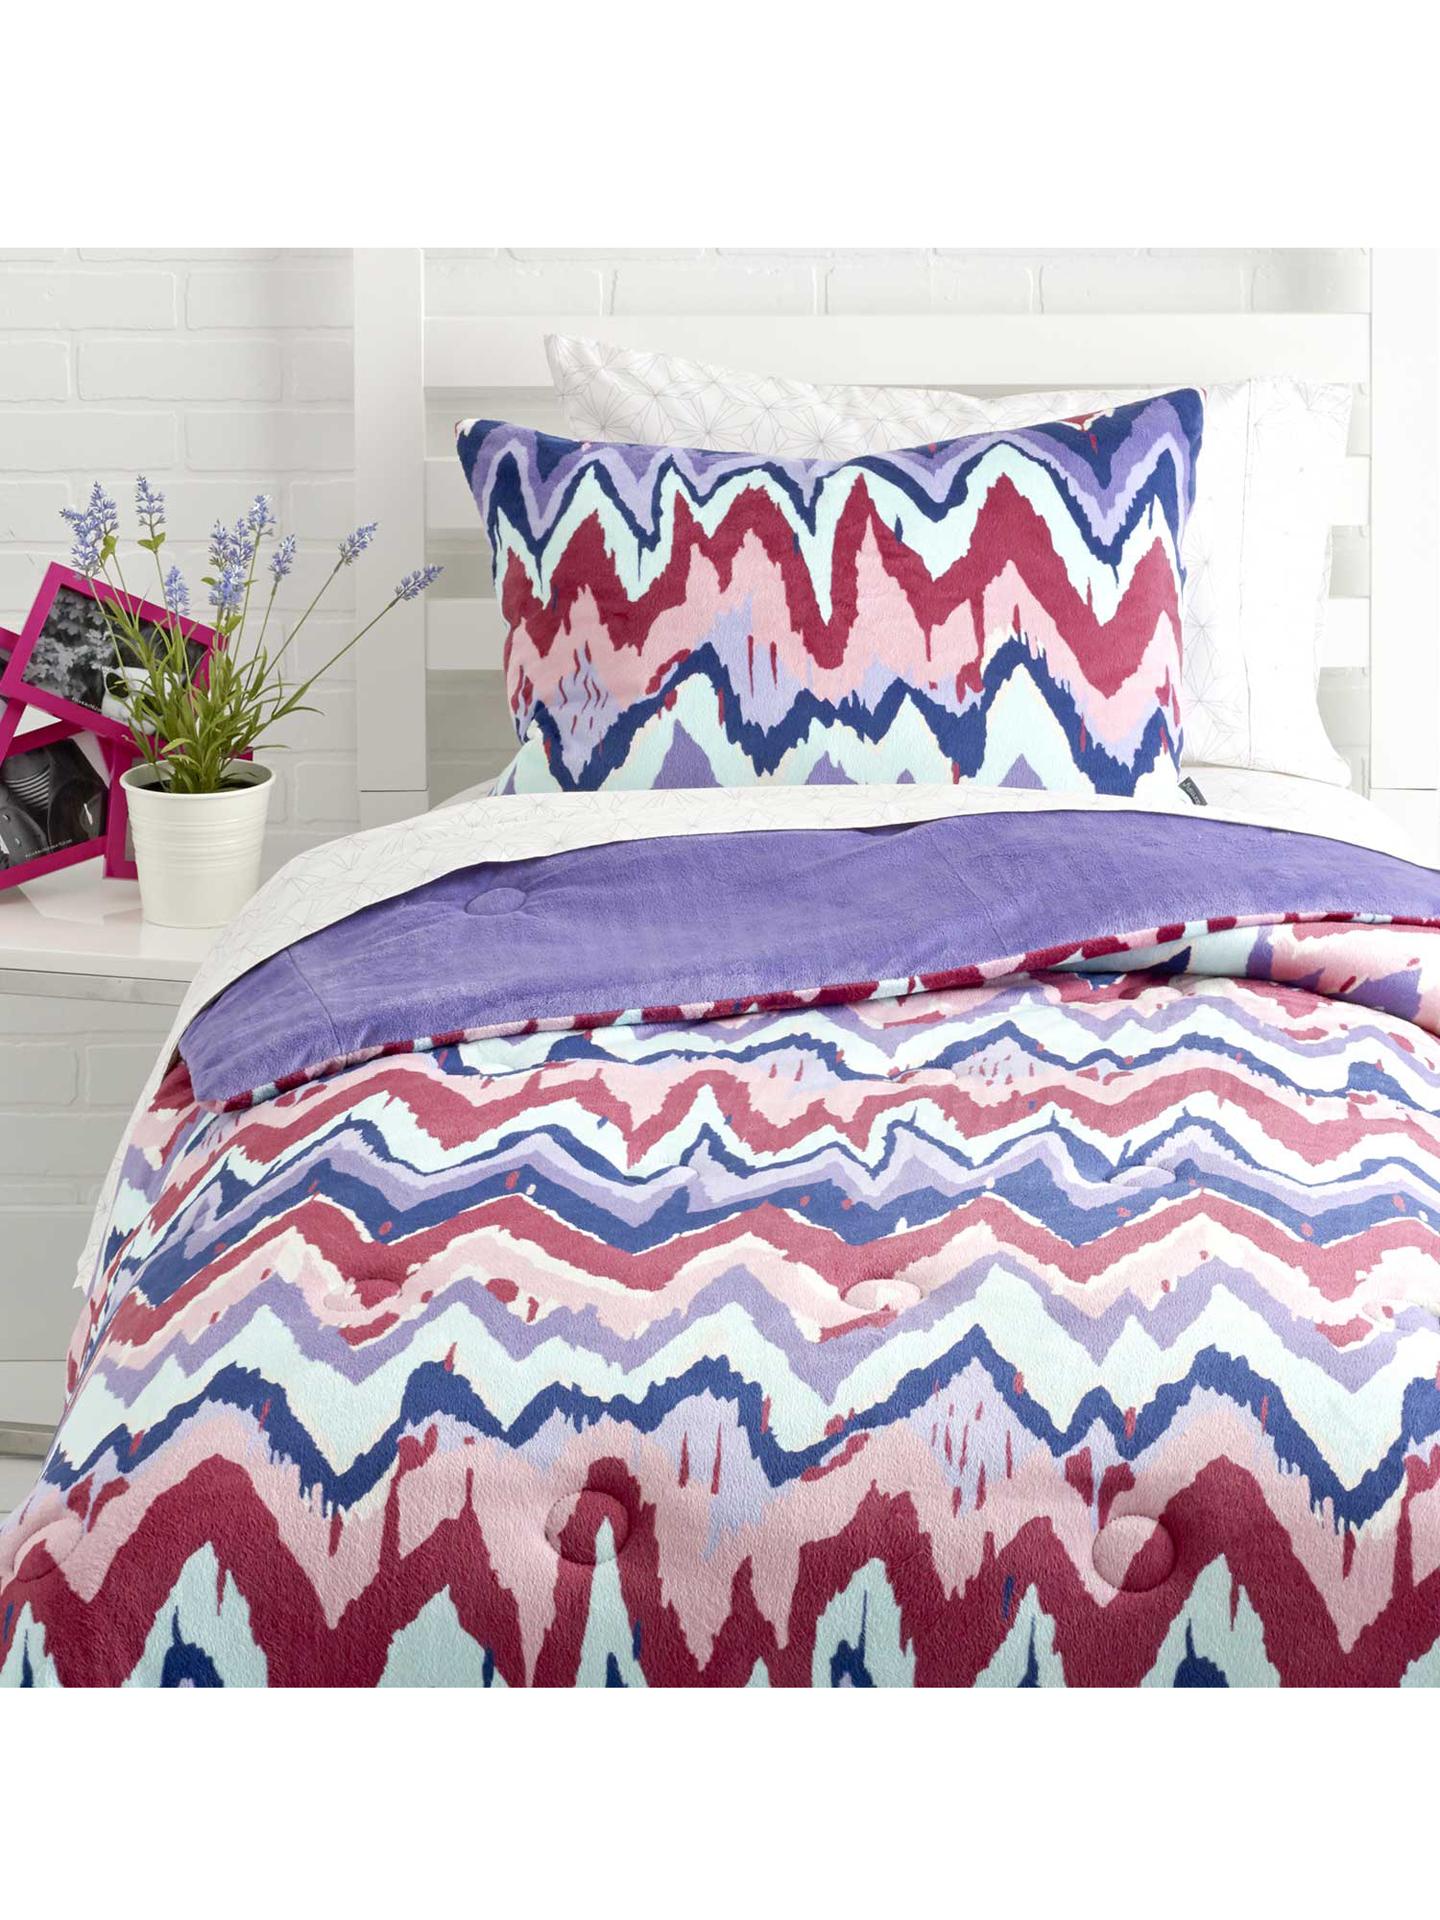 Skulls And Elephant Duvet Cover Aztec Bedroom Furniture